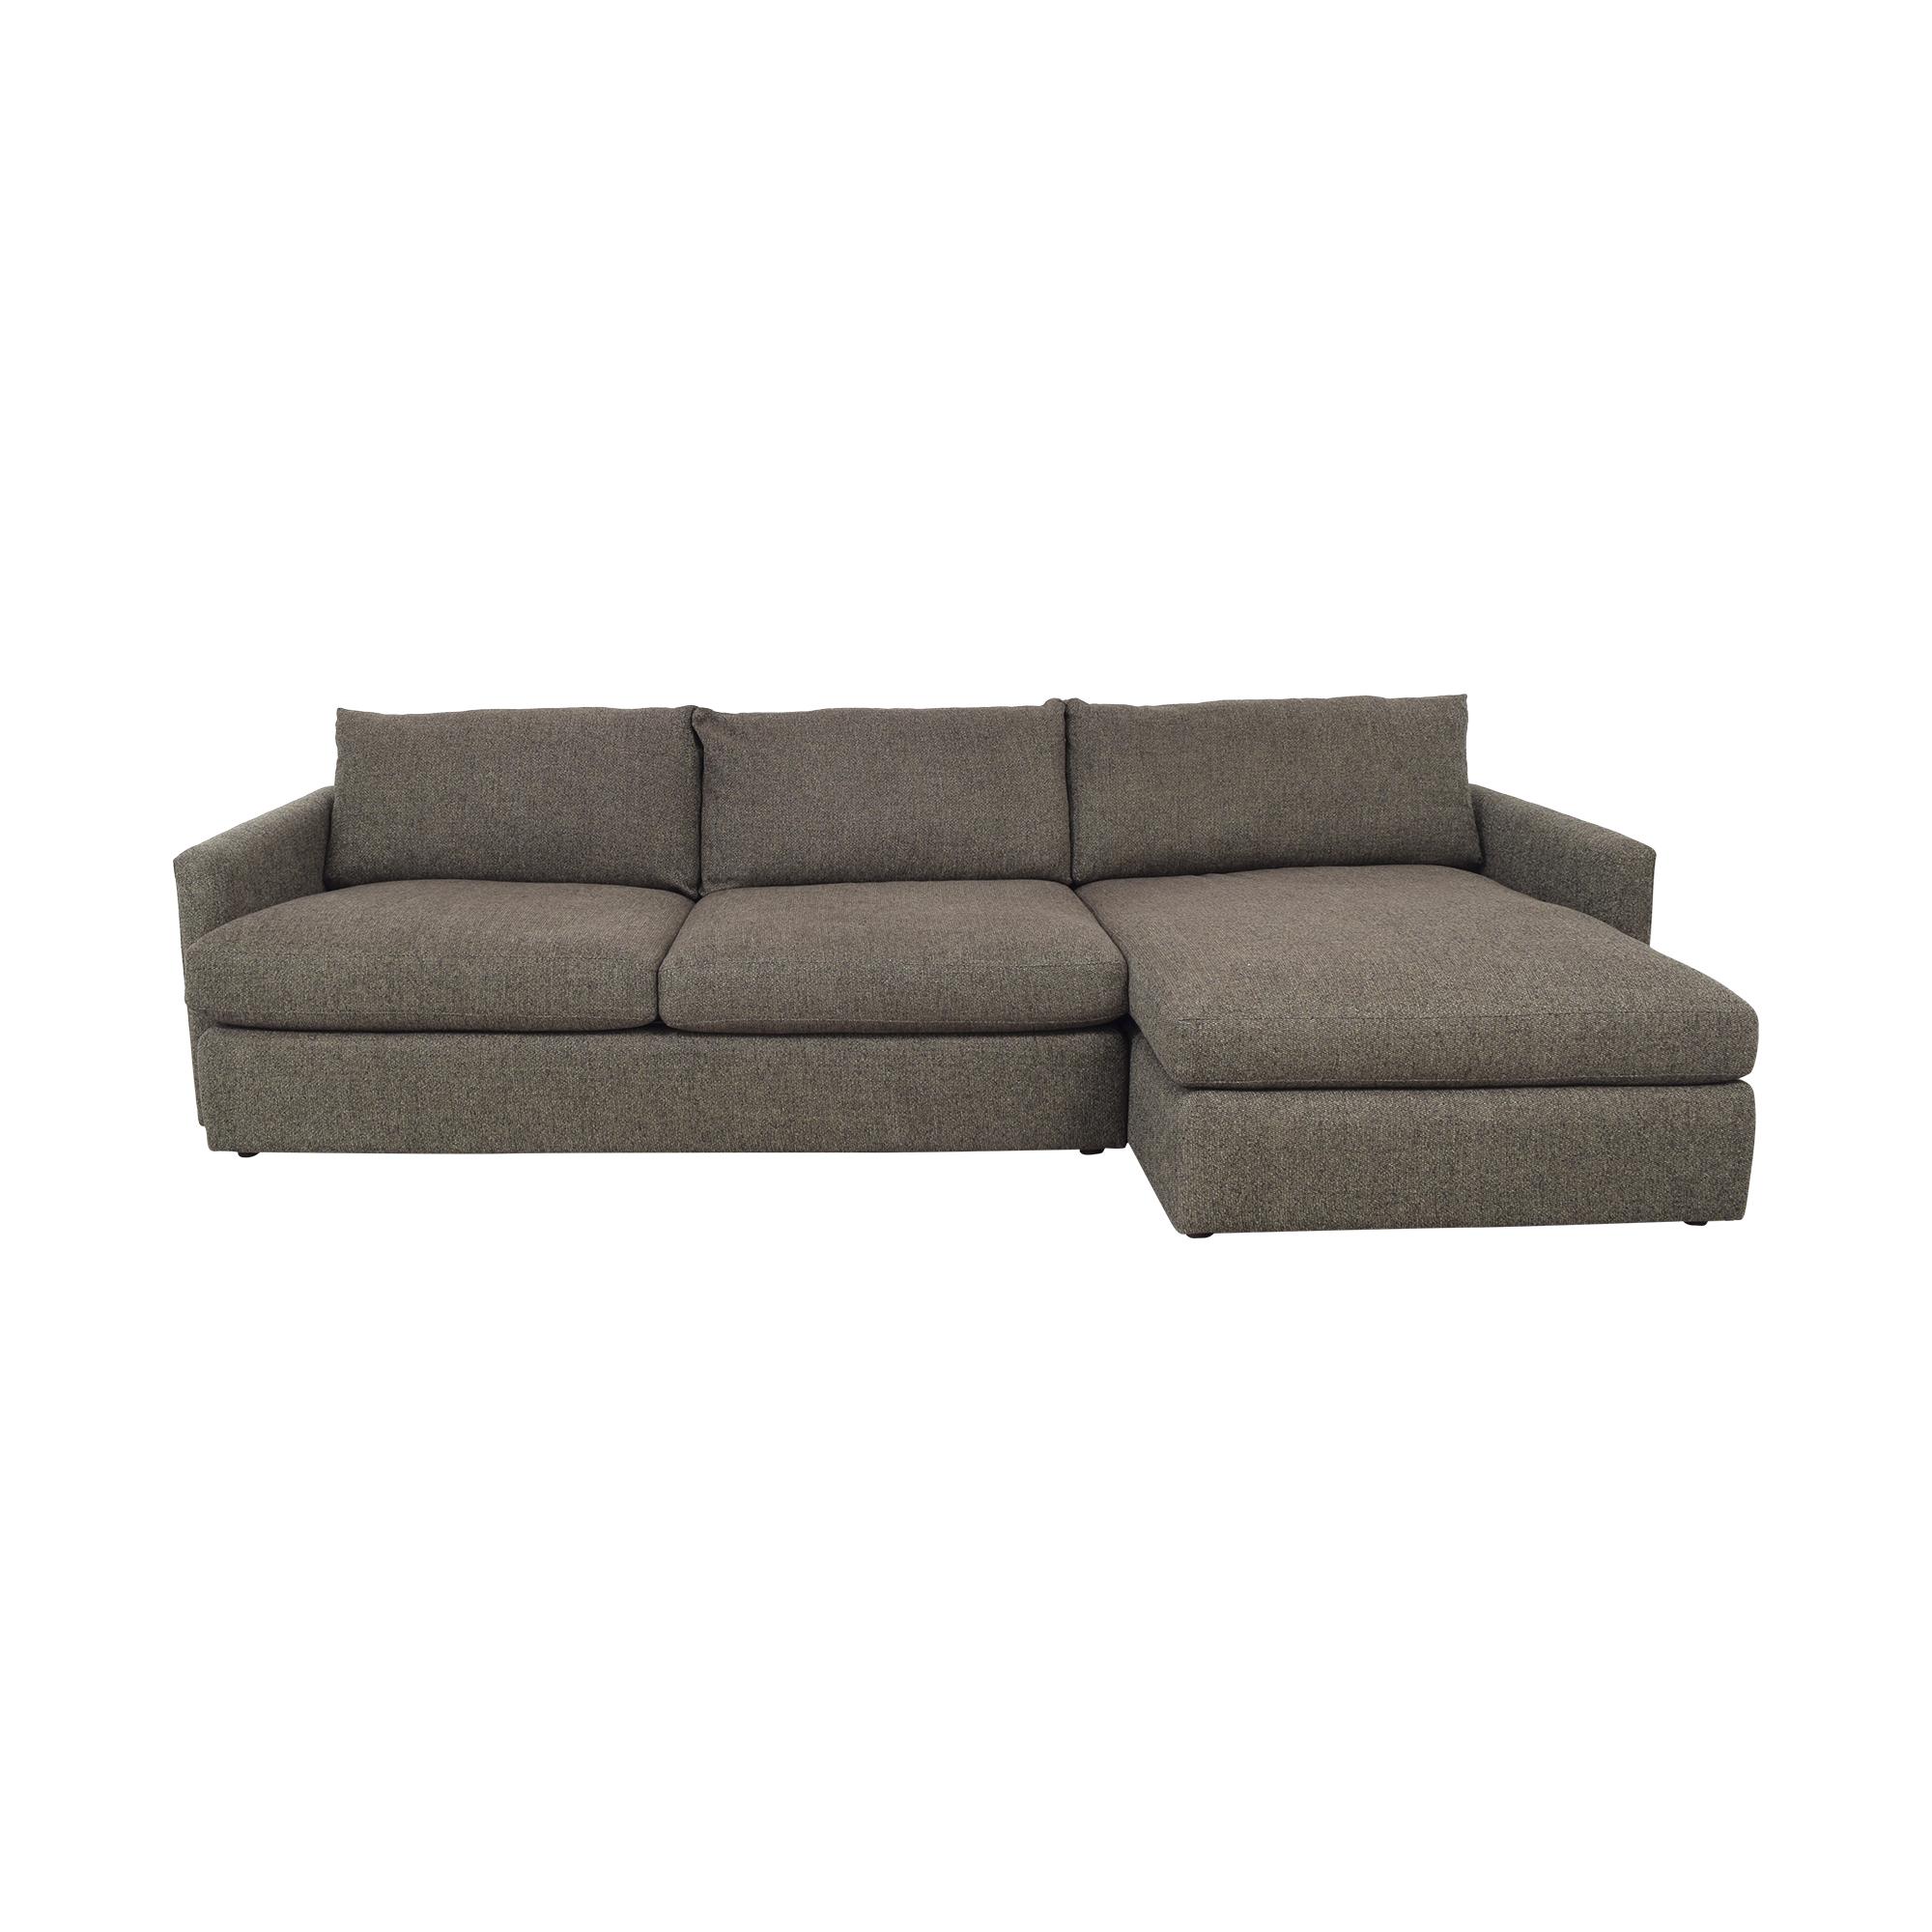 Crate & Barrel Crate & Barrel Lounge II 2-Piece Sectional Sofa nj